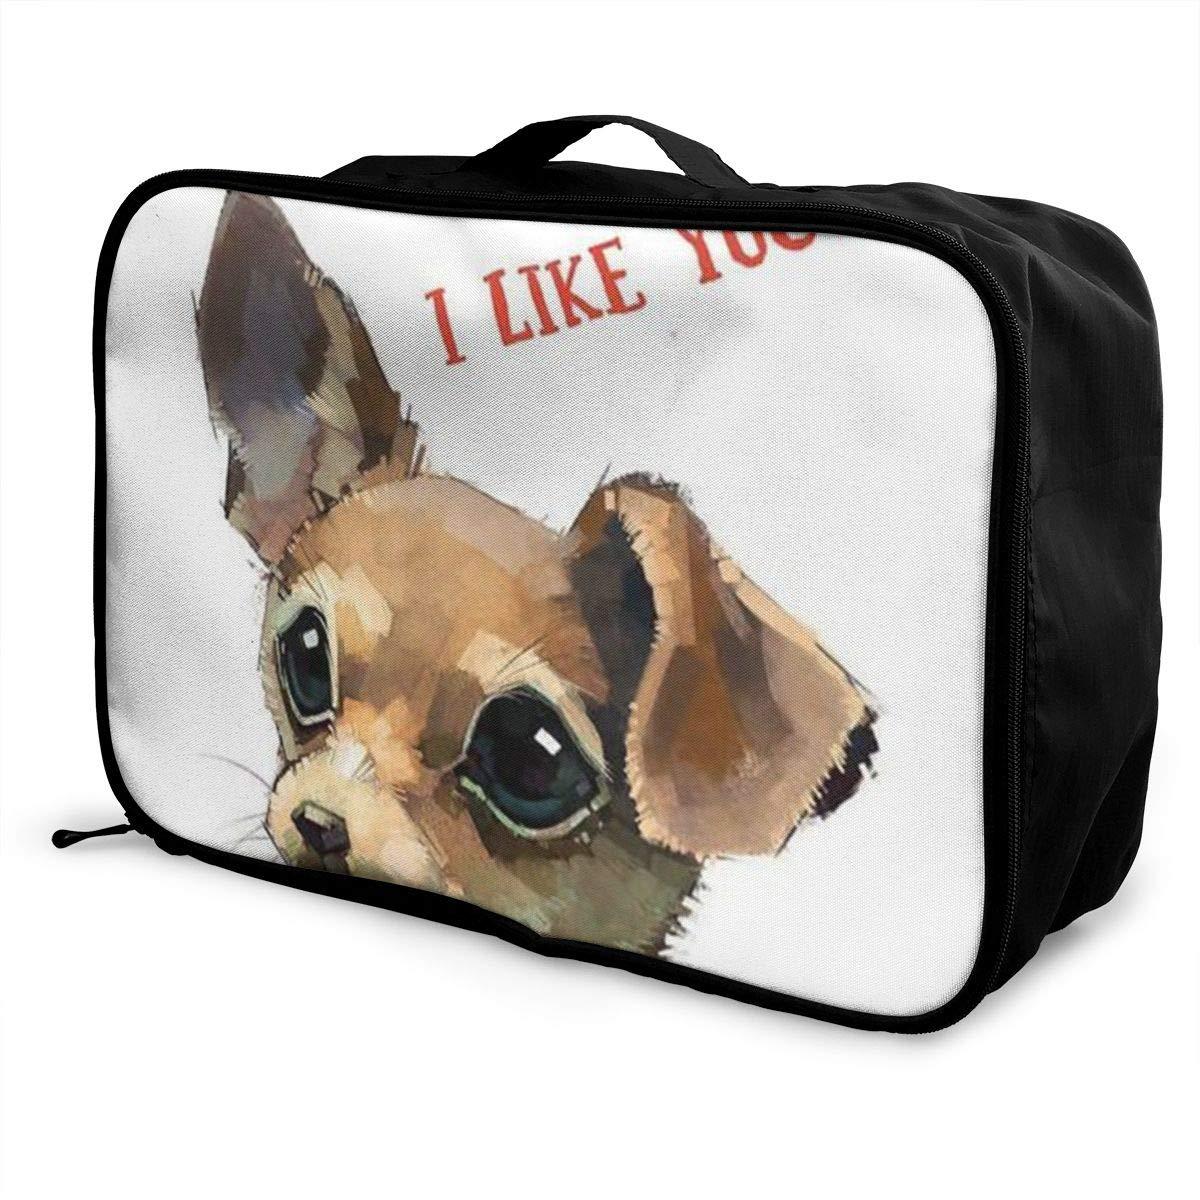 ADGAI Chihuahua Canvas Travel Weekender Bag,Fashion Custom Lightweight Large Capacity Portable Luggage Bag,Suitcase Trolley Bag